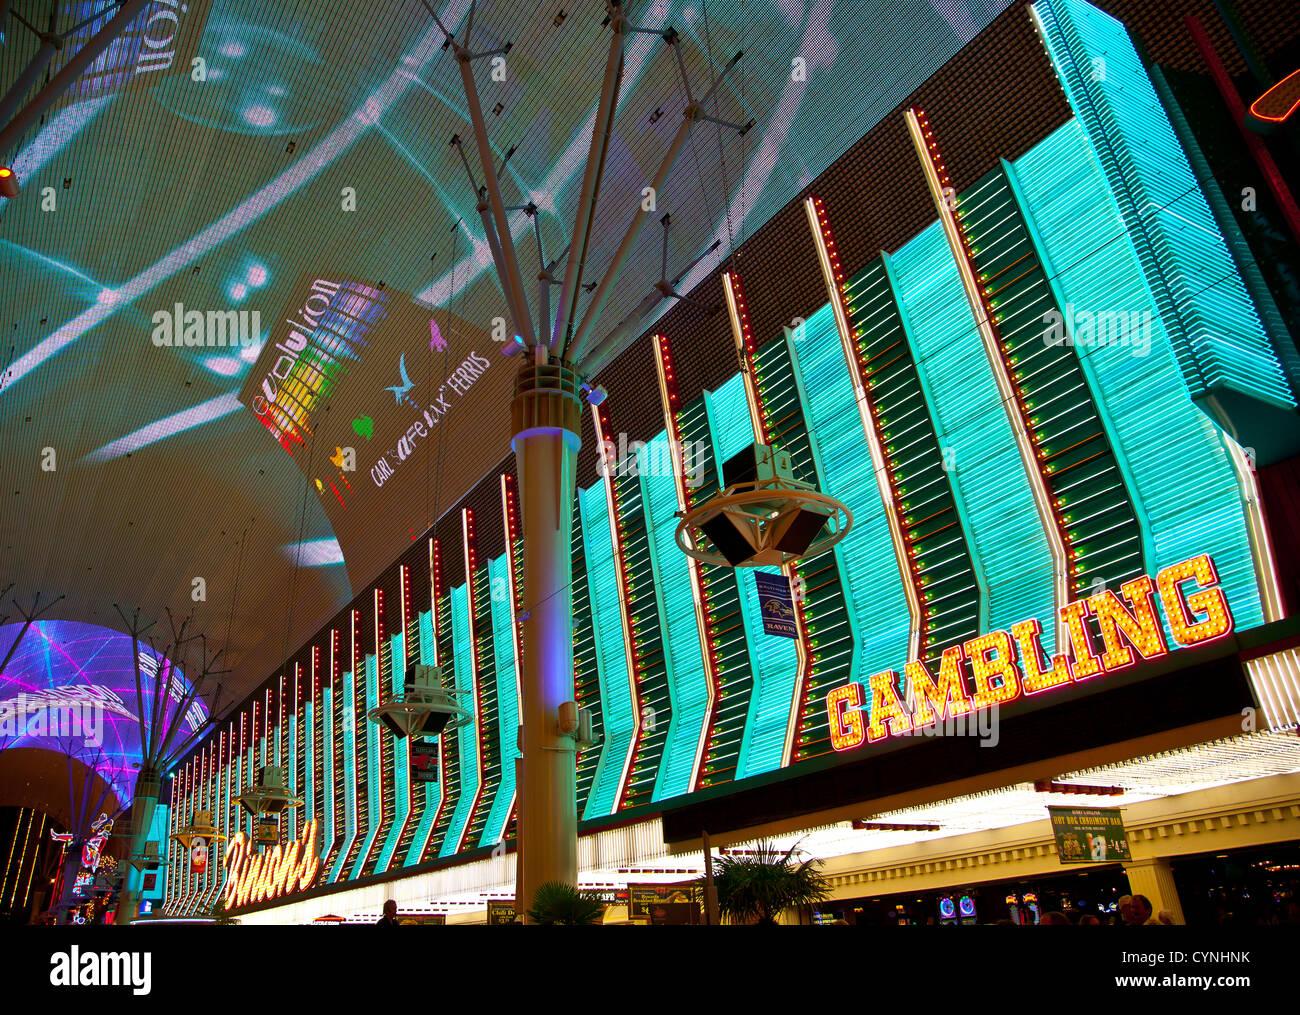 Fremont Street Vegas Stock Photos & Fremont Street Vegas Stock ...